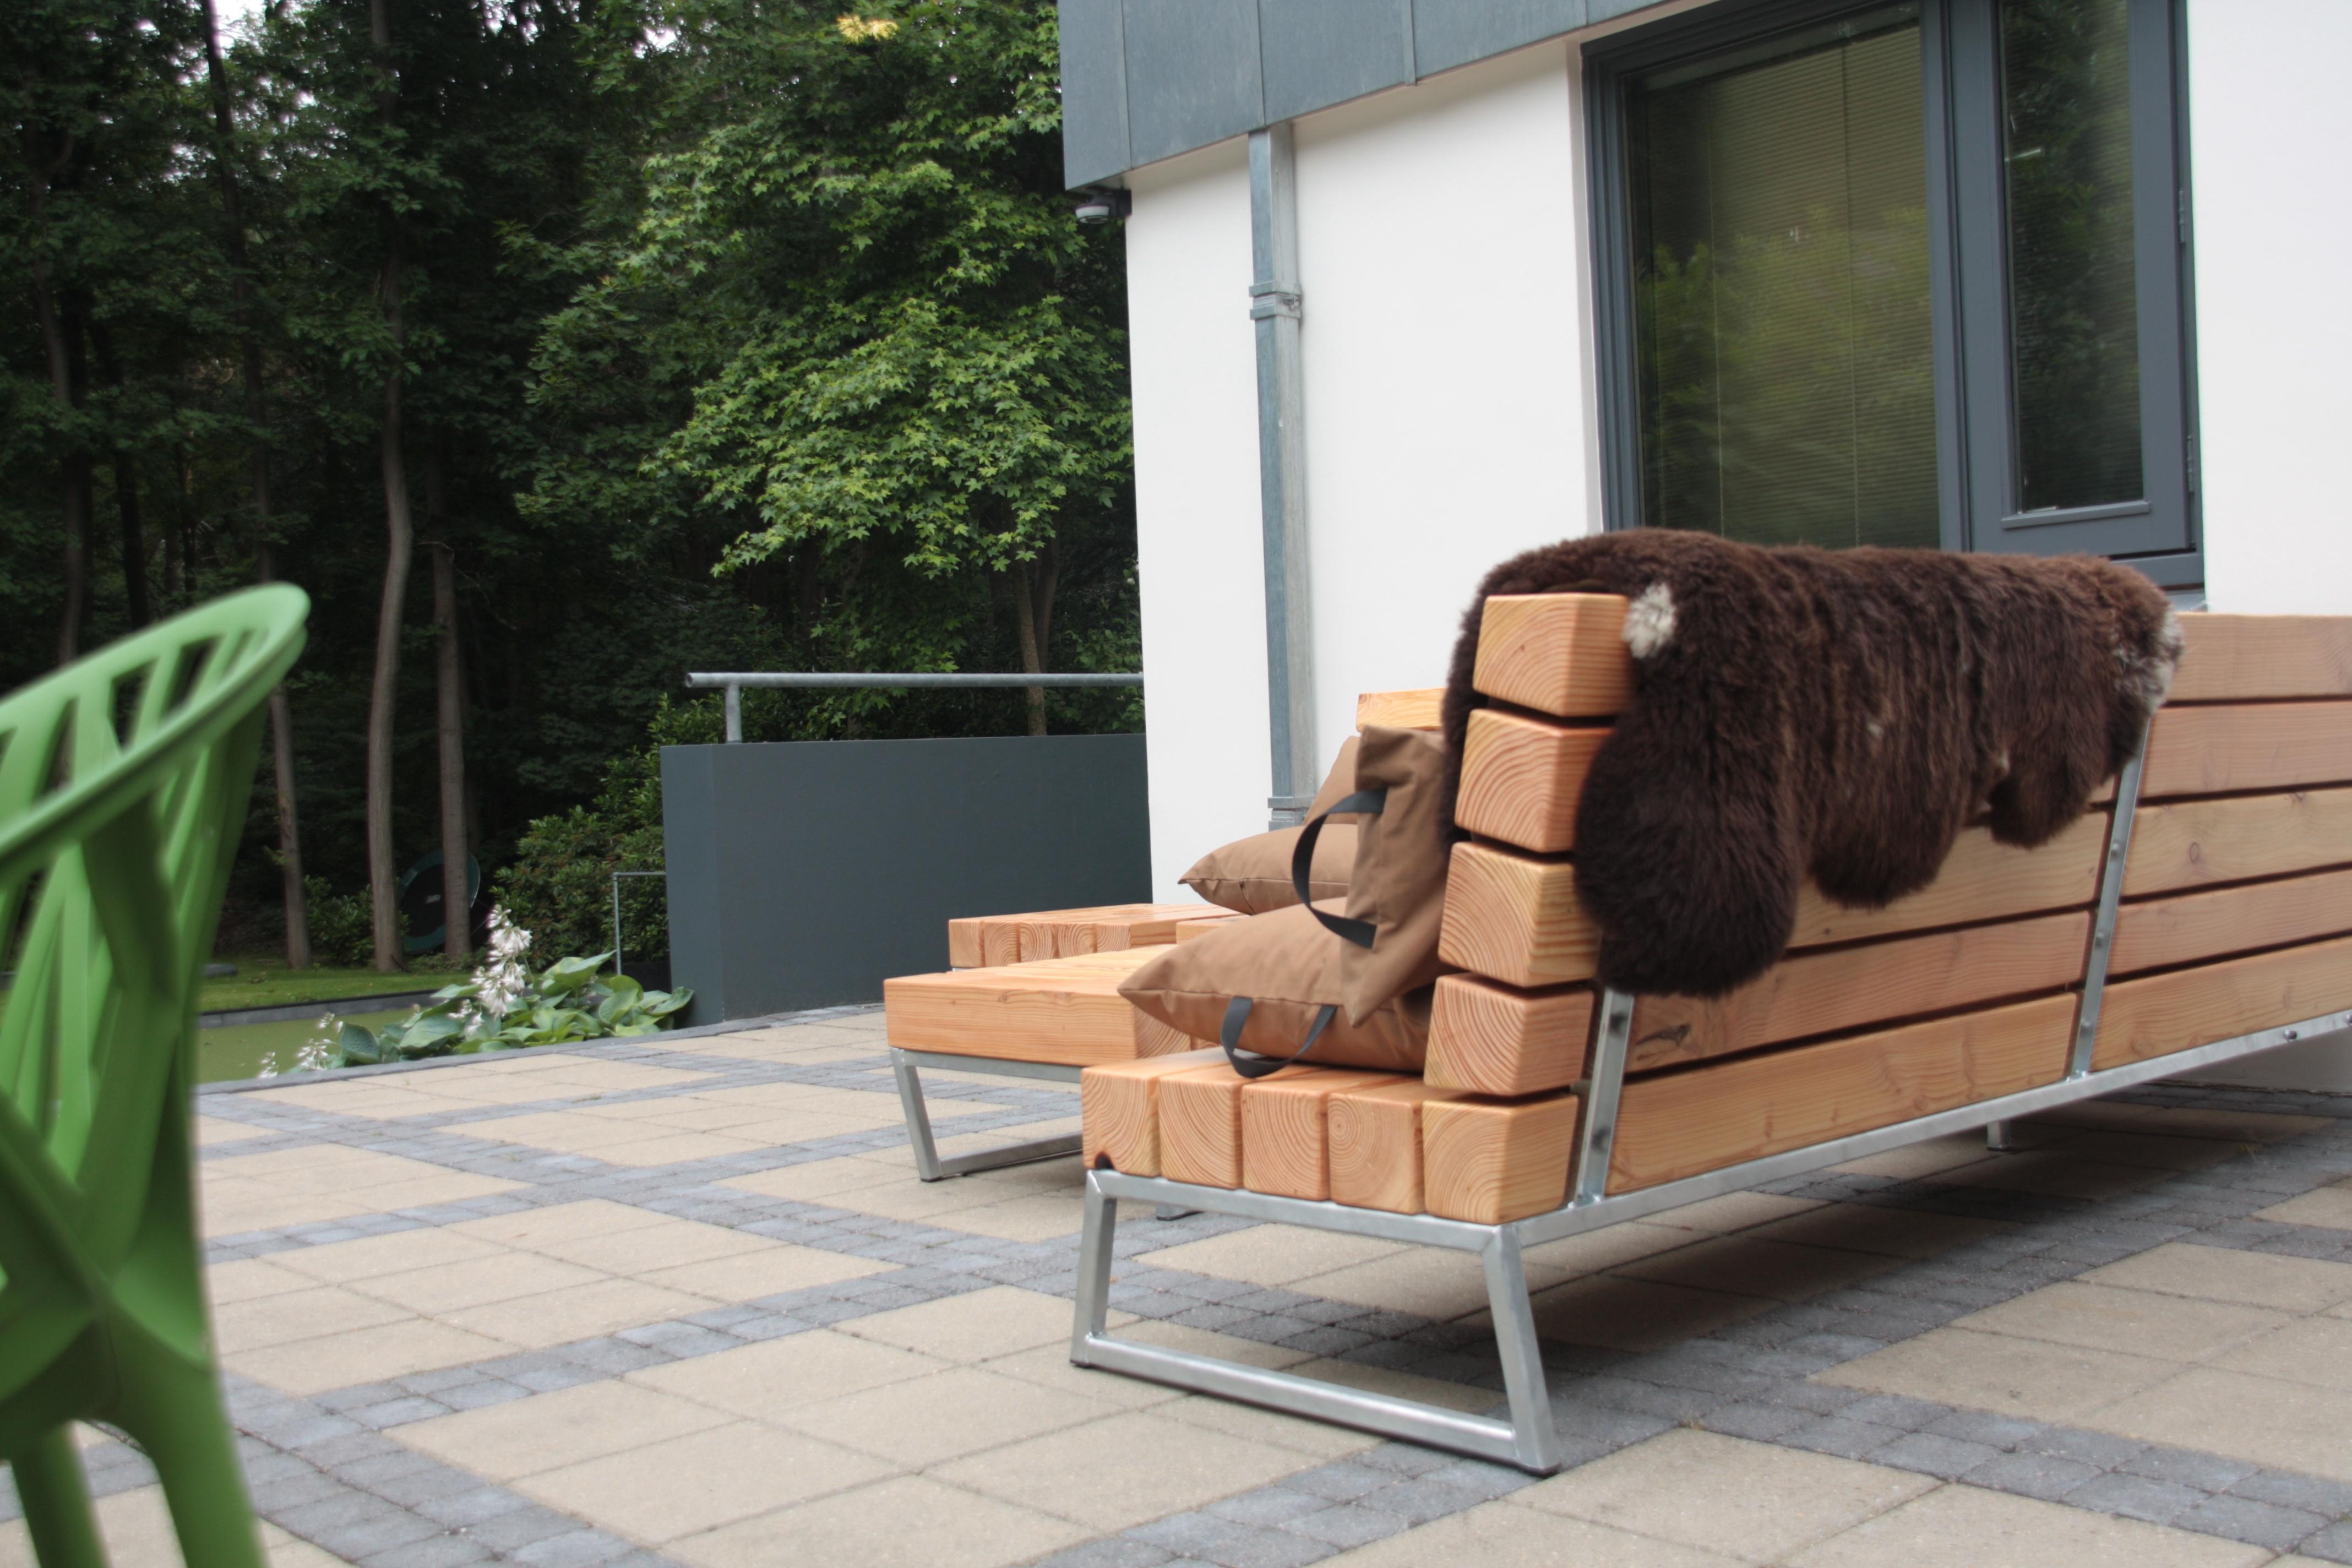 Loungeset Tuin Hout : Loungebank loungeset lounge ook milieubewust douglas hout milieu